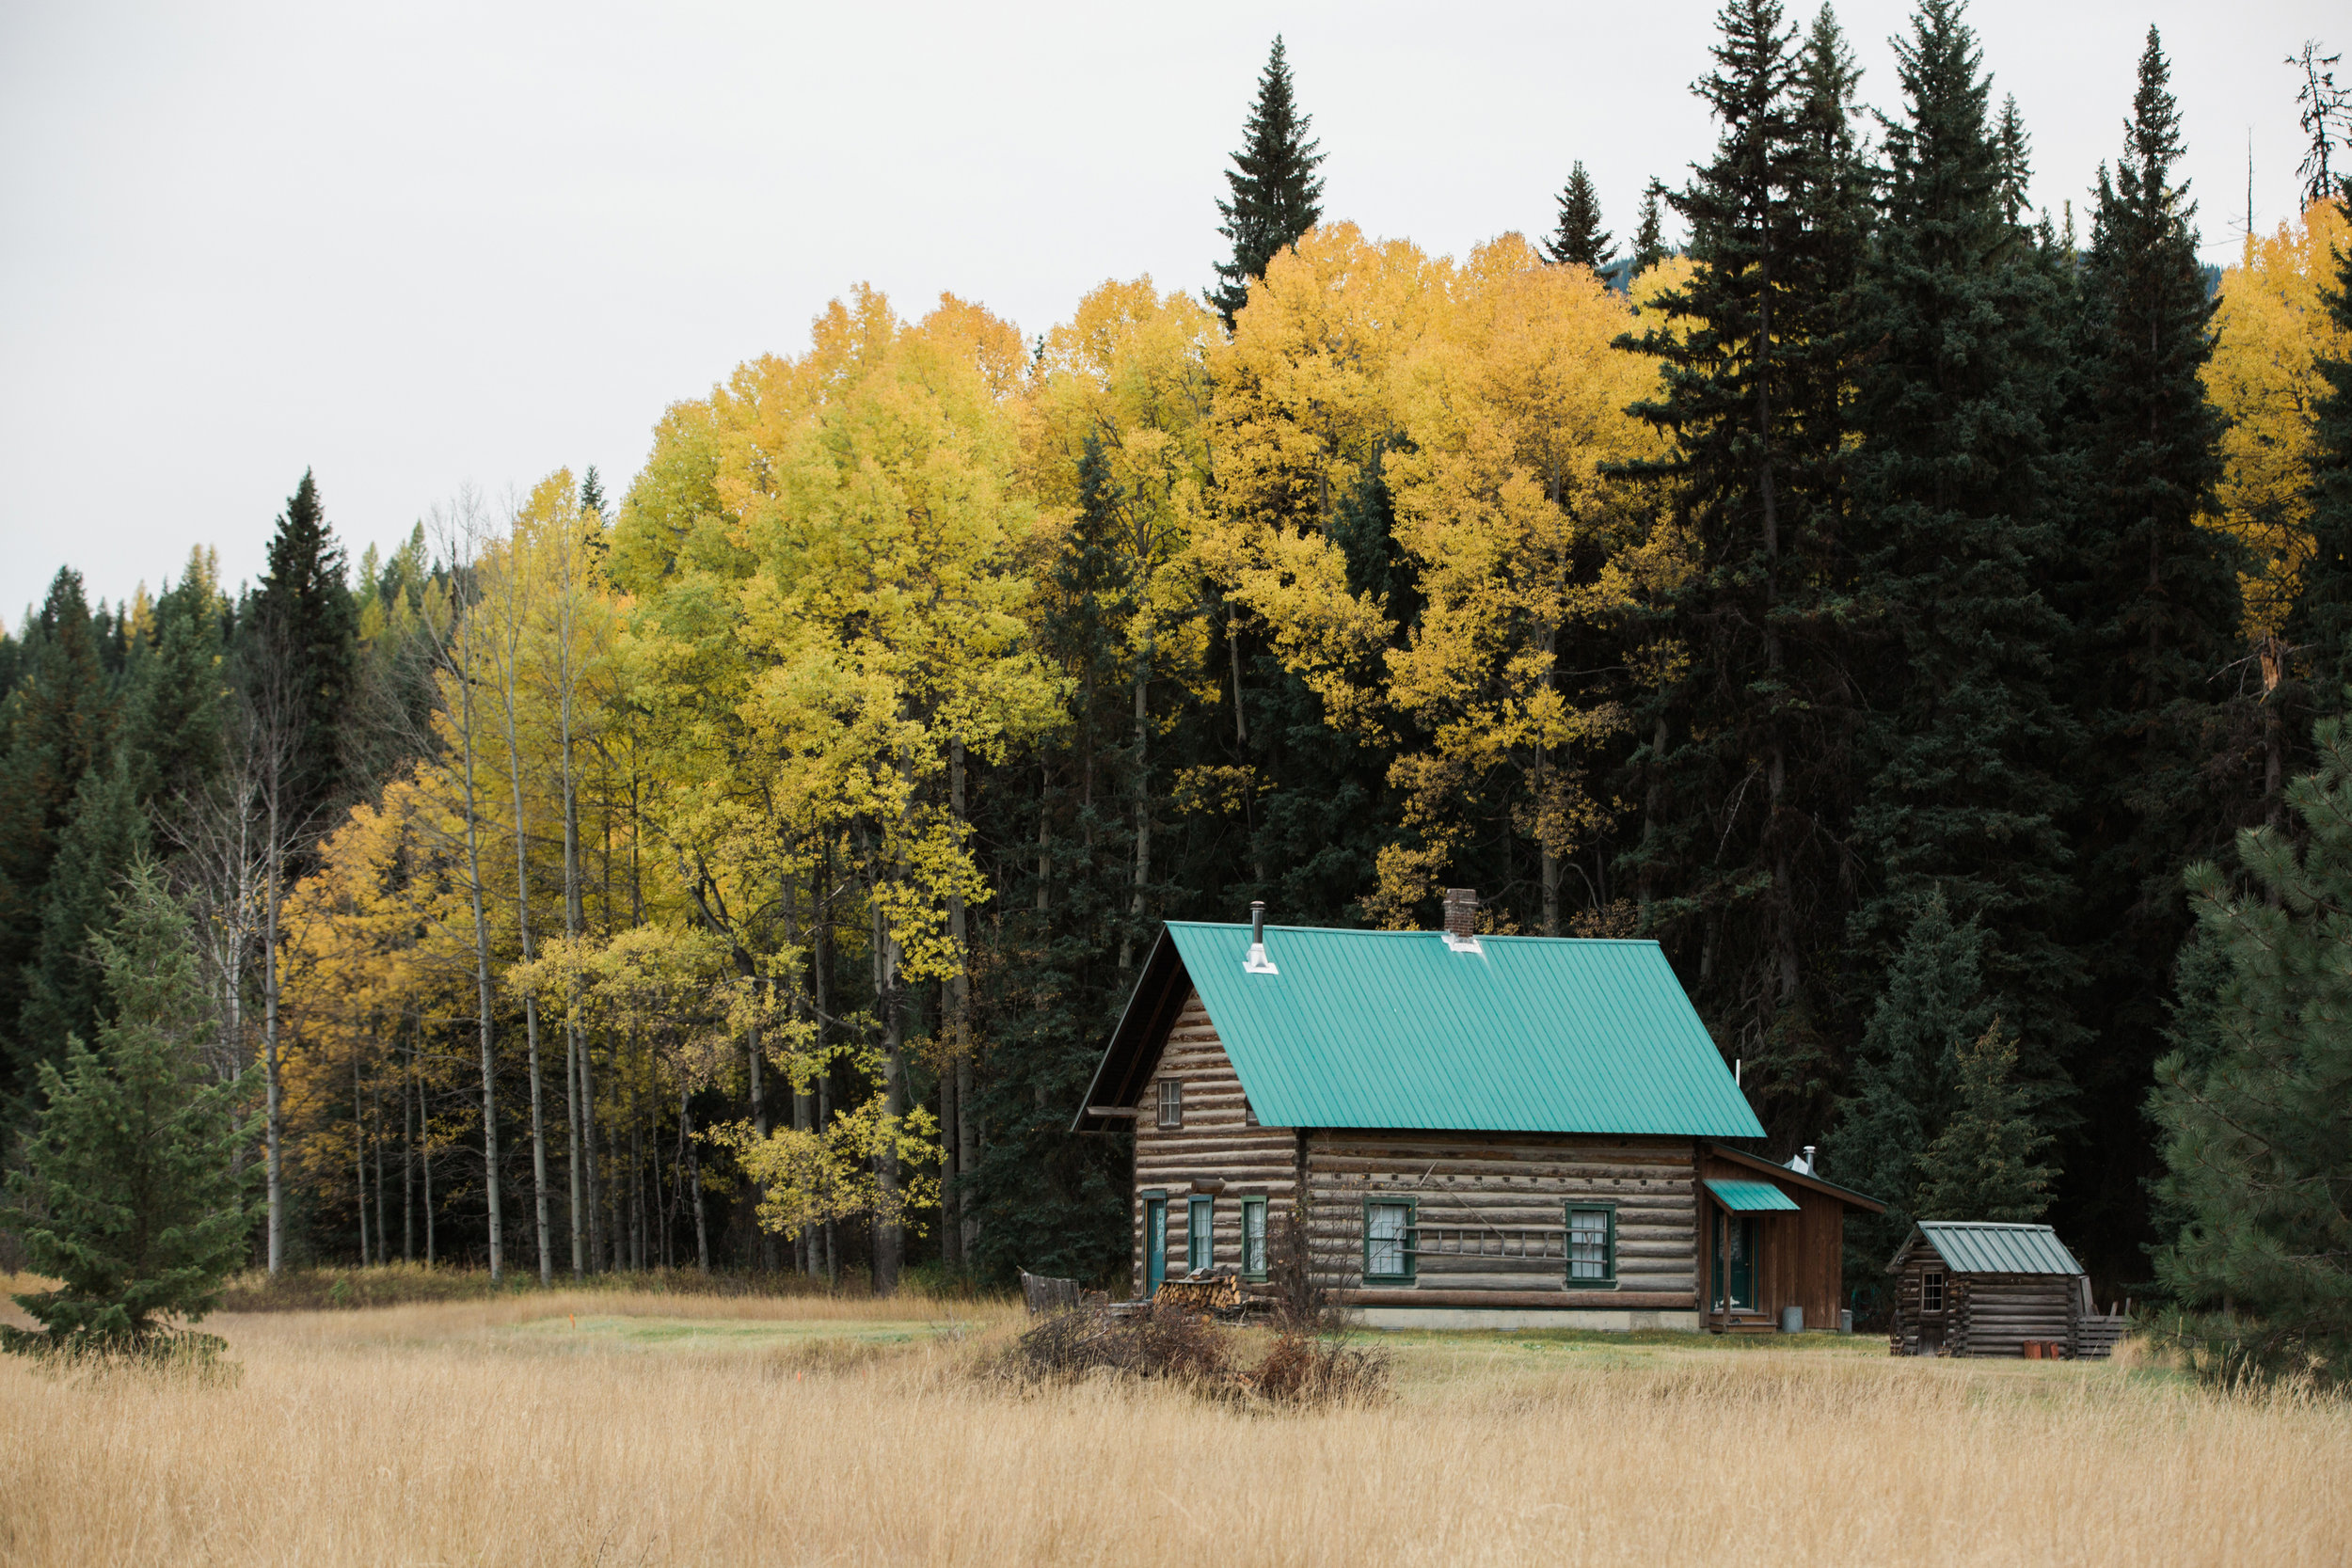 CindyGiovagnoli_Glacier_National_Park_Montana_mountains_lake_fall_autumn_road_trip-035.jpg